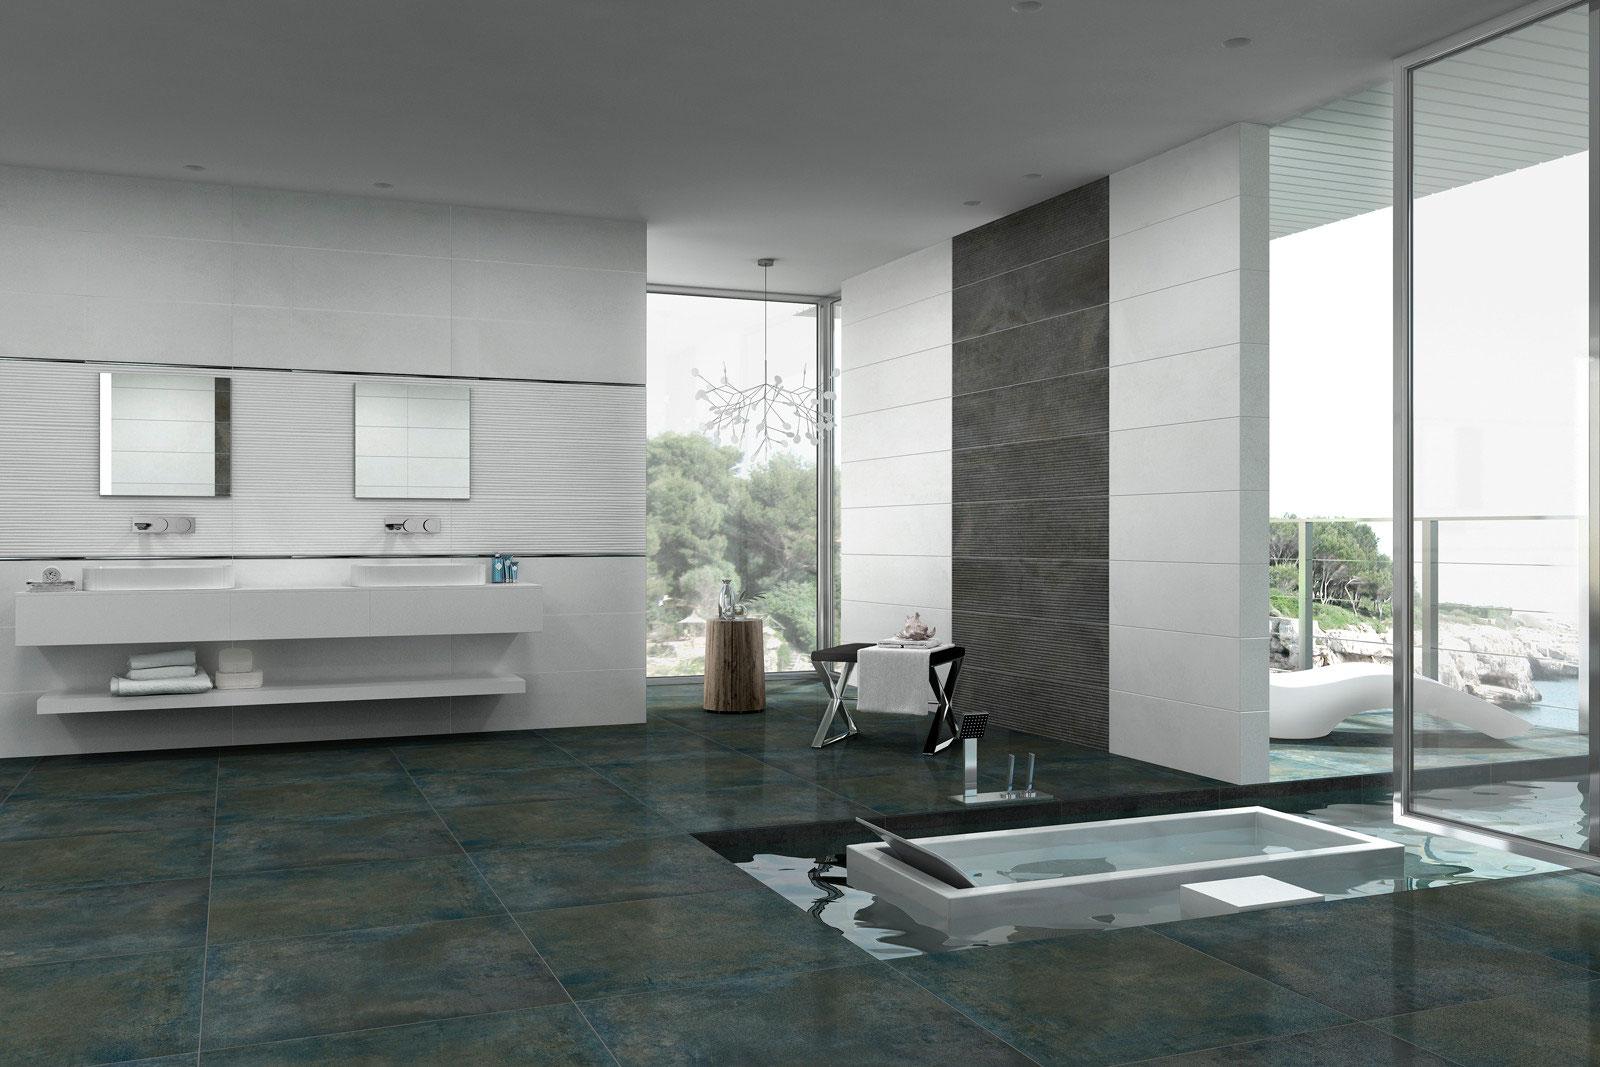 Meuble De Salle De Bain Allemand mobilier de salle de bains & accessoires - bel&ross céramica